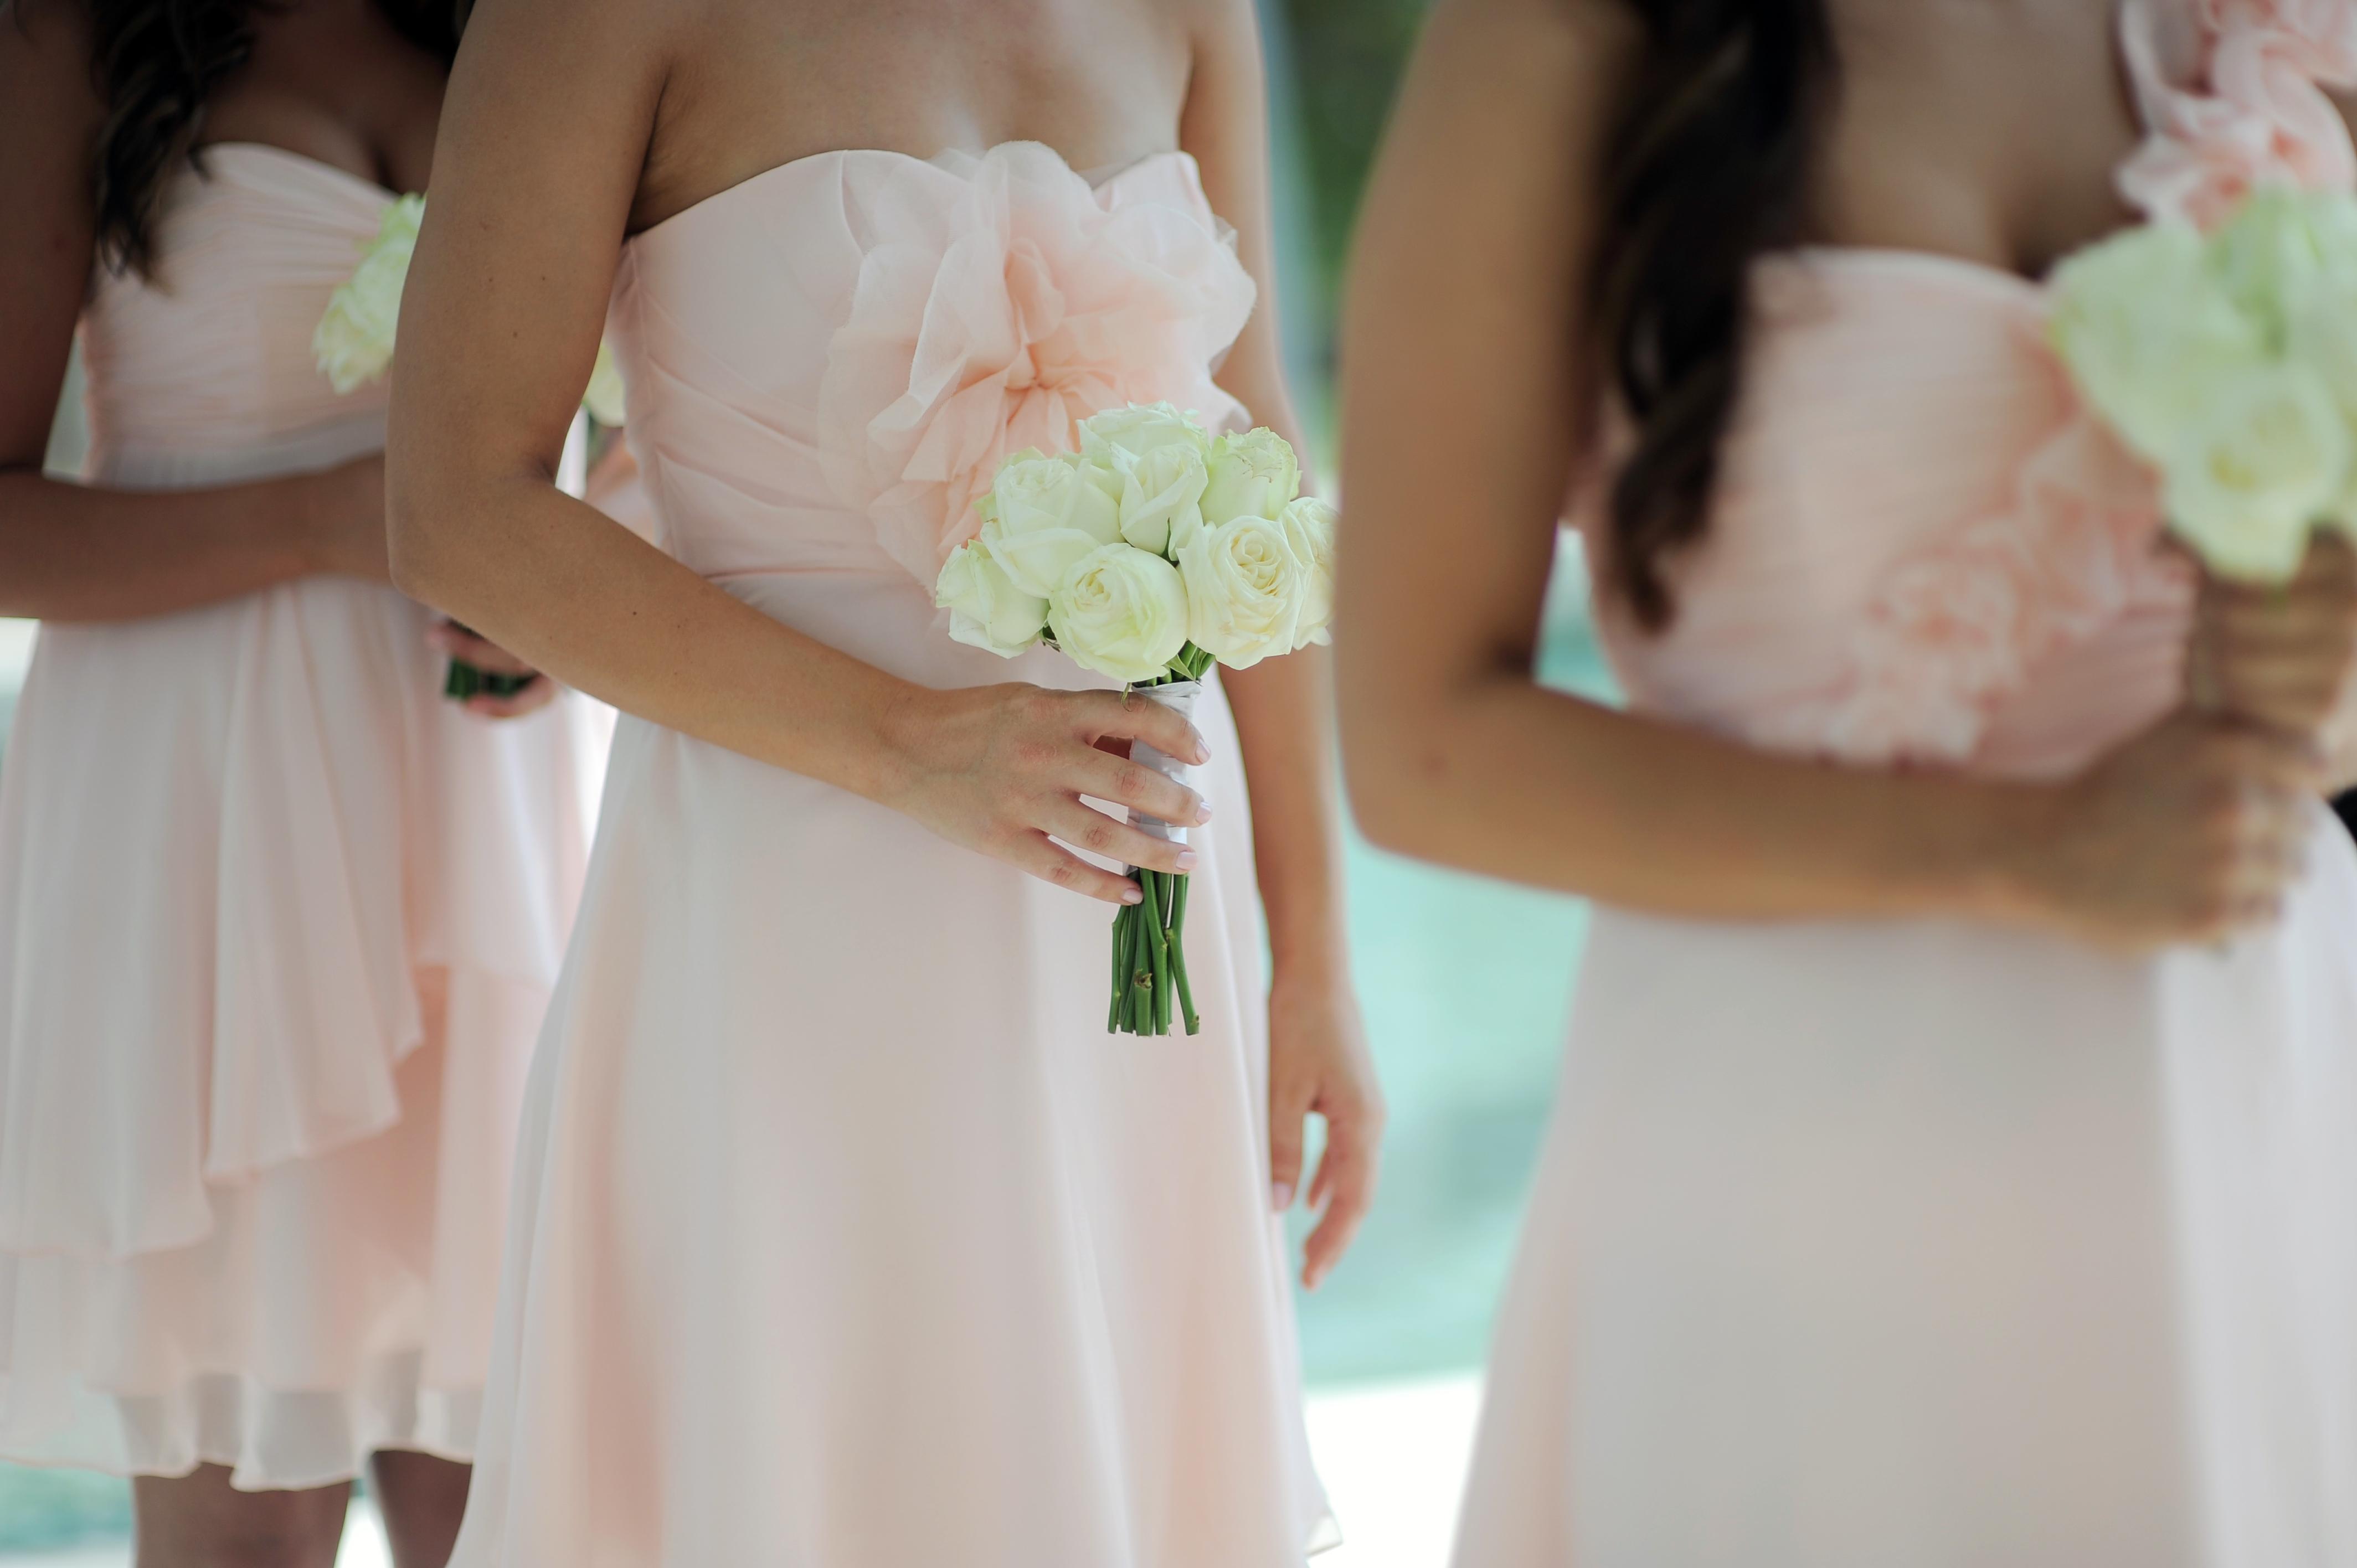 Pure White  Rose Bridesmaid Bouquet Cliff top Wedding Bali by Destination Wedding Planners Jody Q Weddings Bali Wedding Planners Jody Q Weddings  www.jodyqweddings.com.au